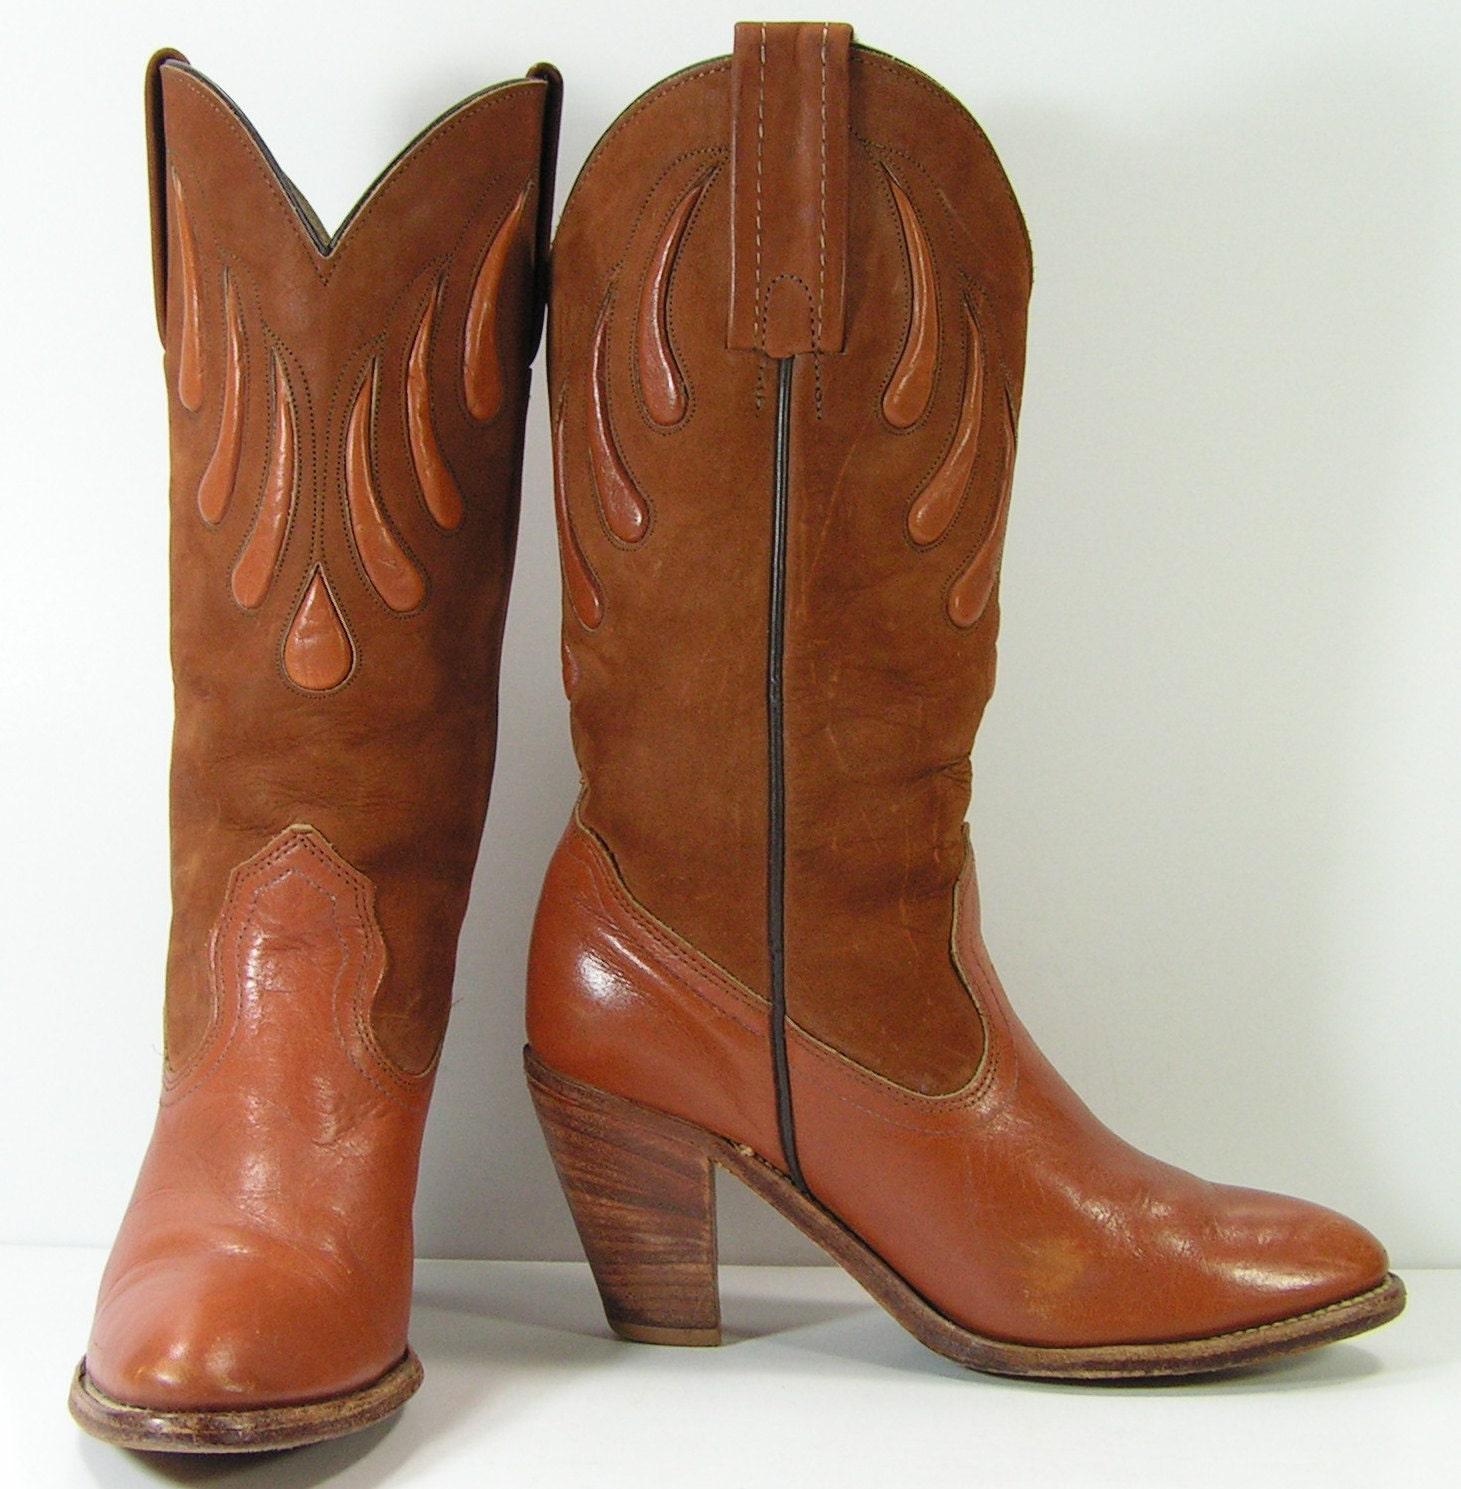 frye cowboy boots womens 6 5 b m vintage western high heels